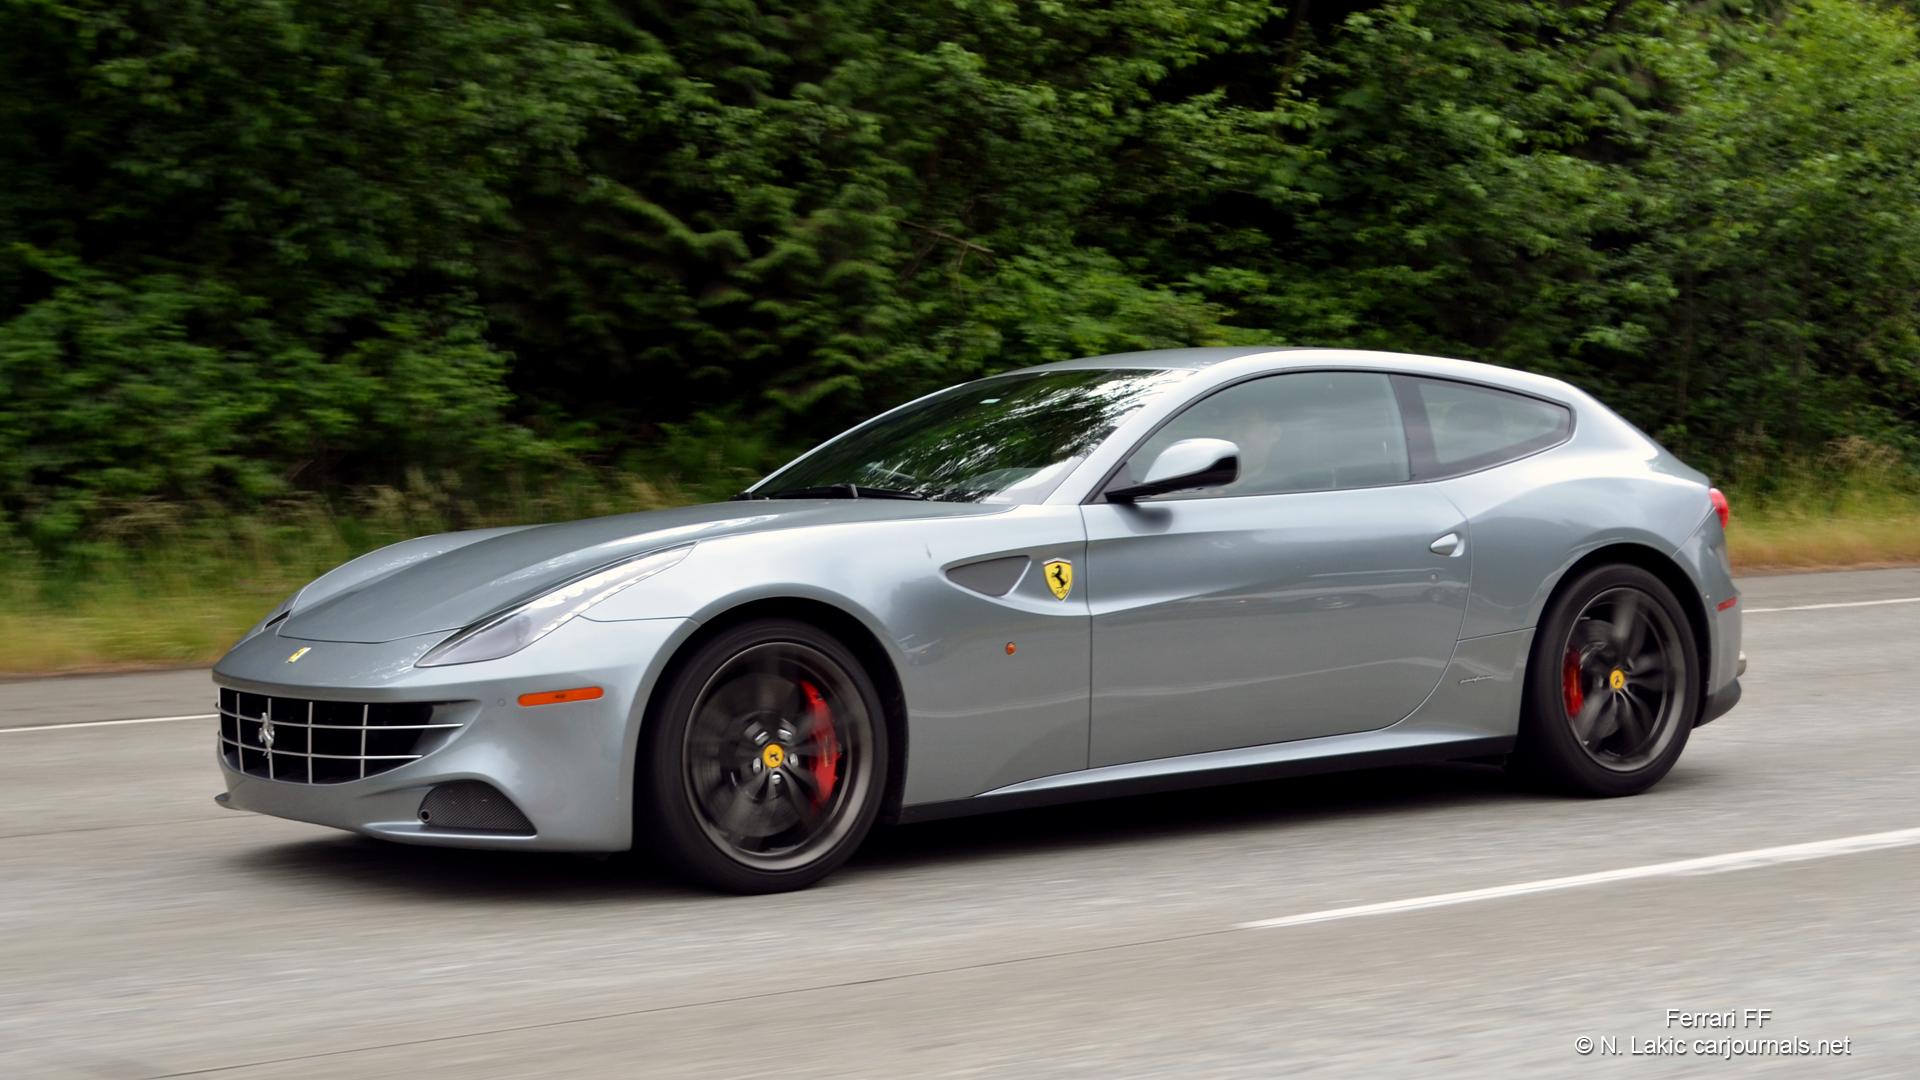 HD Car Wallpapers - Gray Ferrari FF - Car Journals